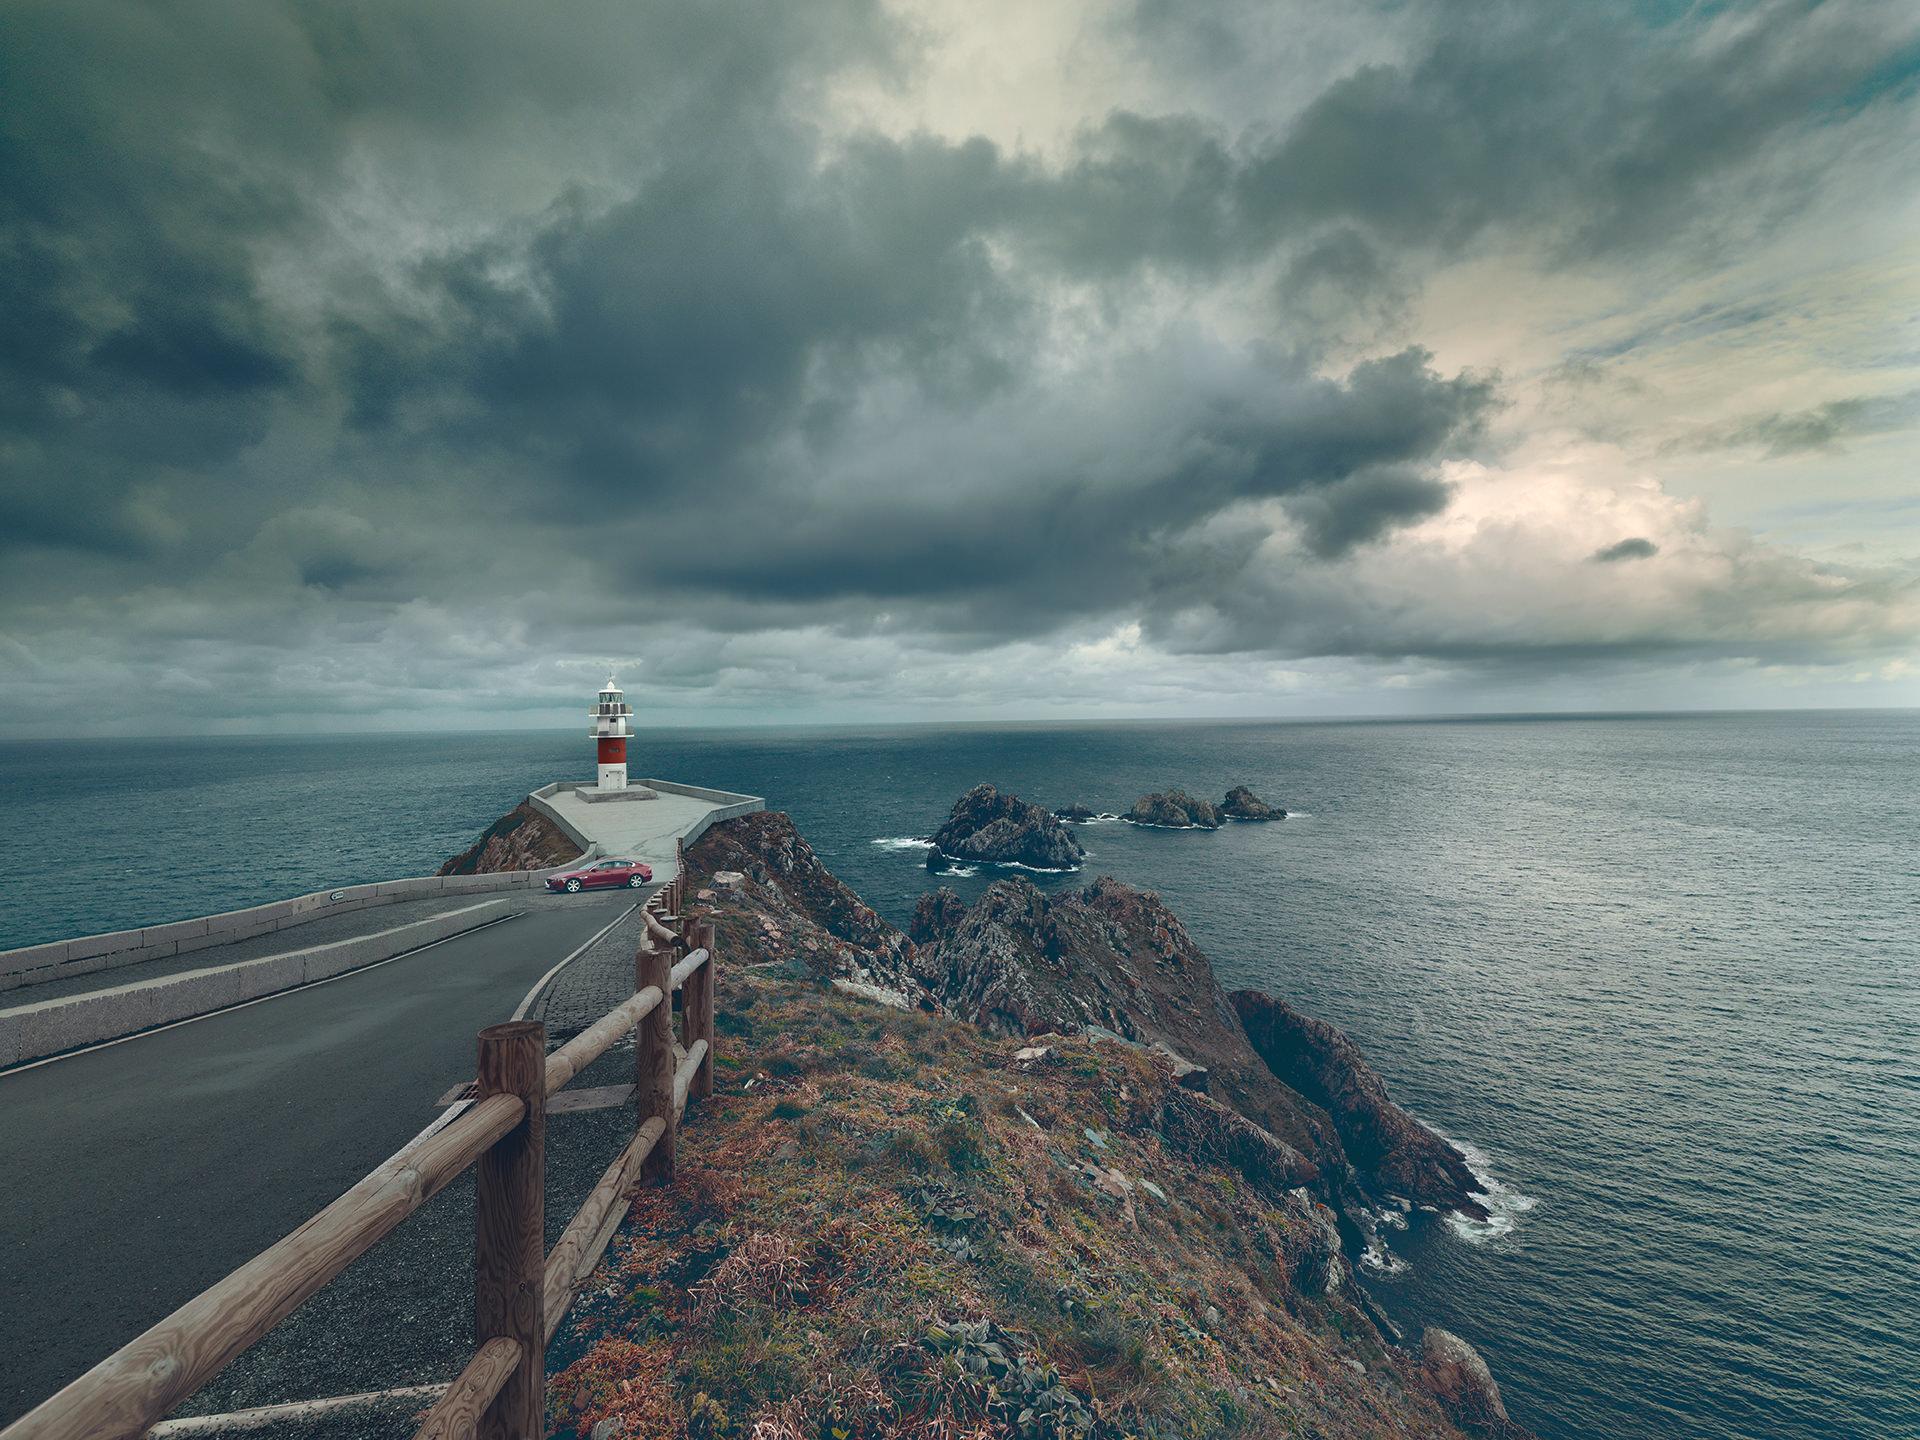 ©ankeluckmann1724, coast, galicia, green, landscape, rocks, spain, anke luckmann, www.ankeluckmann.com, sea, jaguar, lighthouse